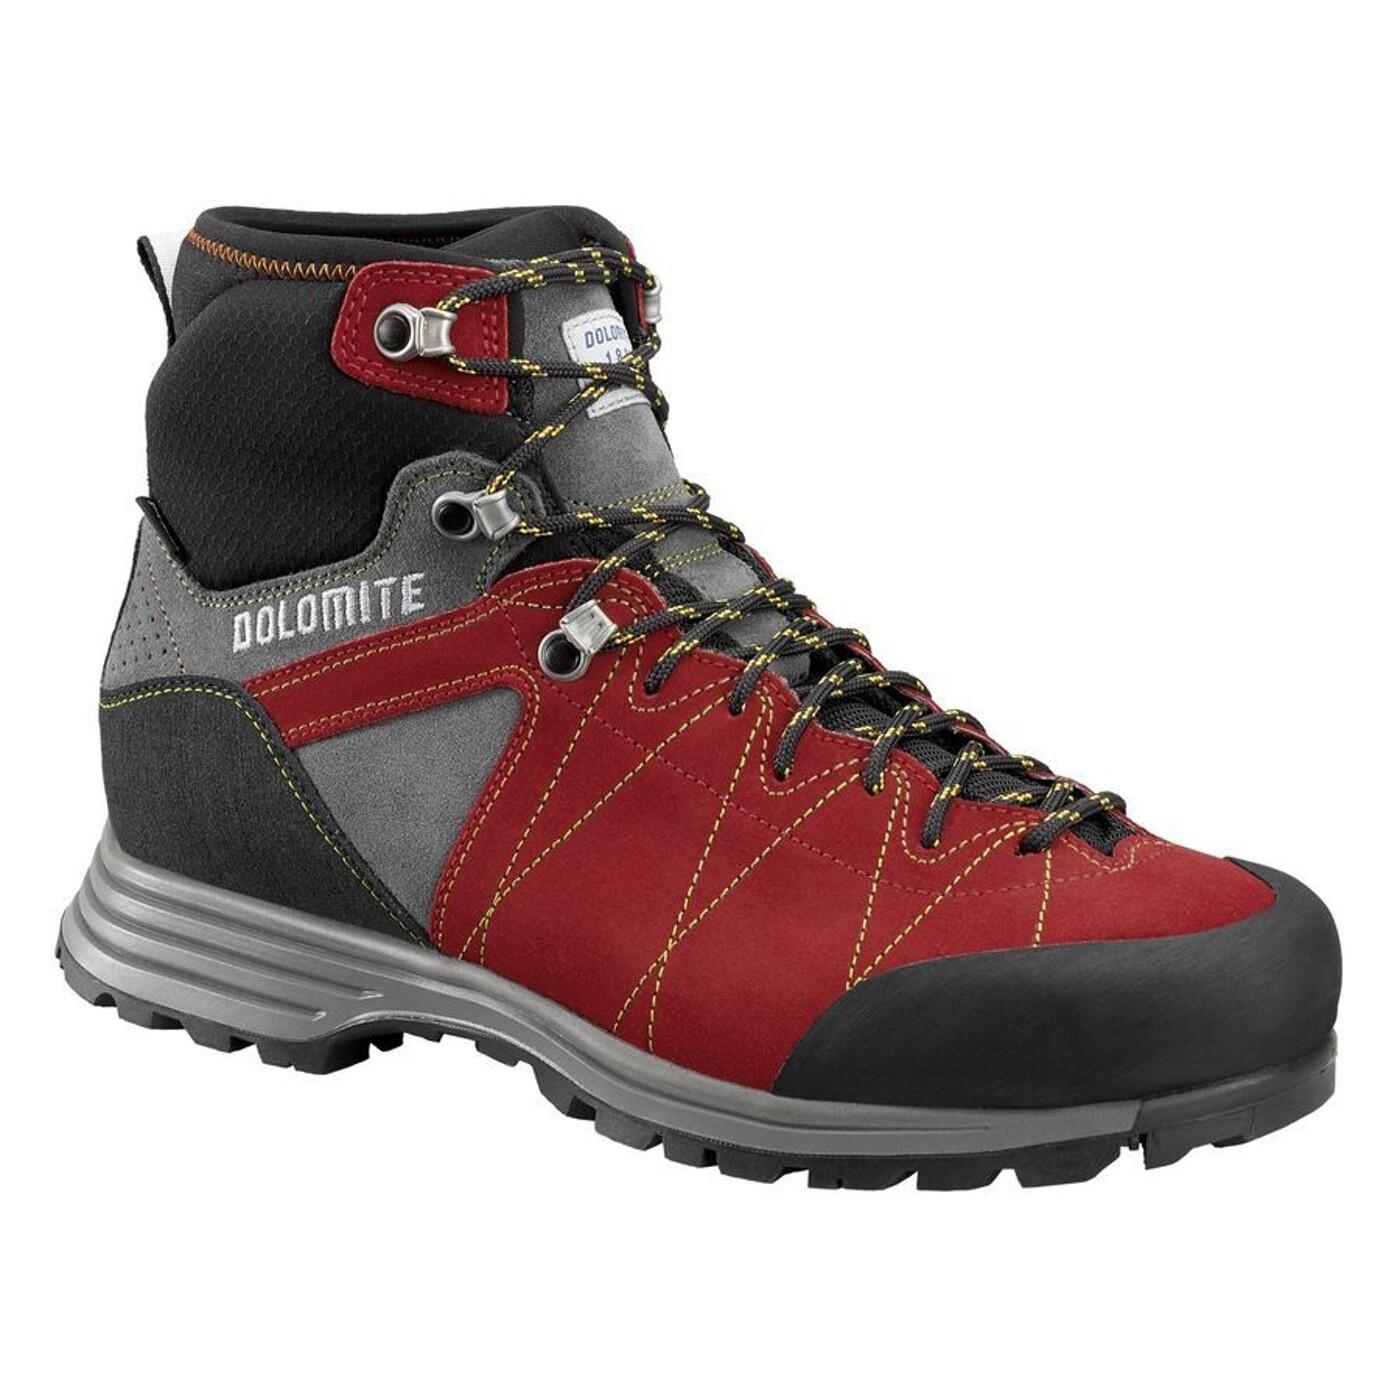 SCOTT Wanderschuhh DOL Shoe Steinbock Hike Gtx 1.5 Dolomite - Herren